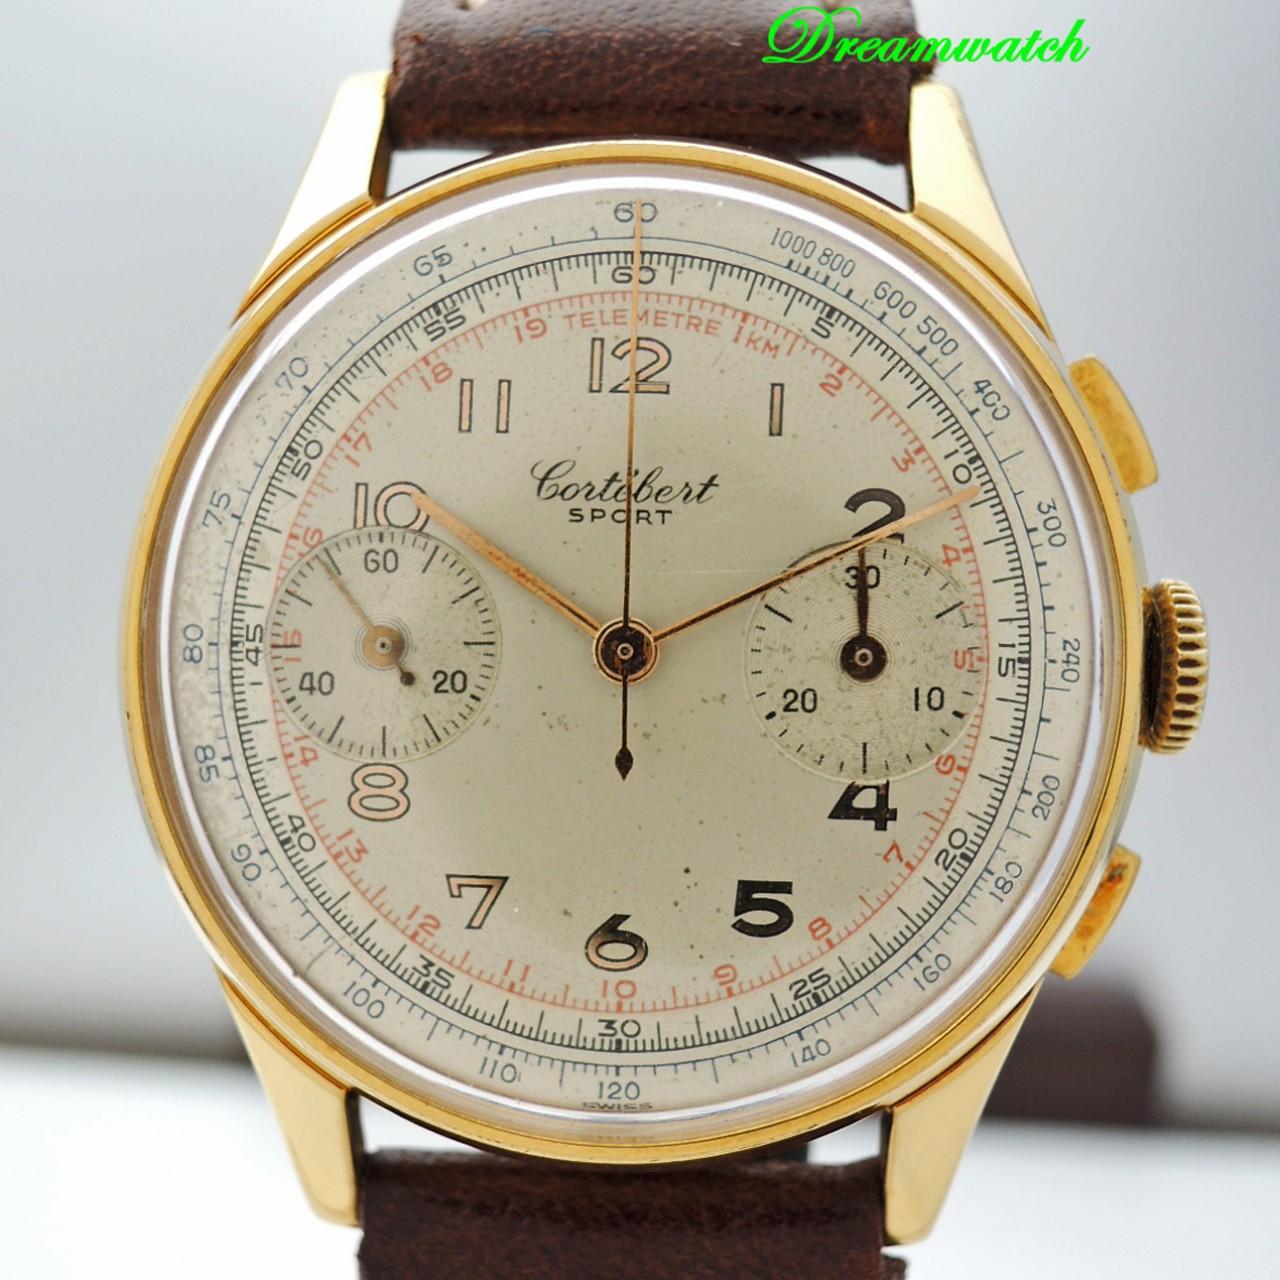 Cortebert Chronograph Venus 150 Vintage